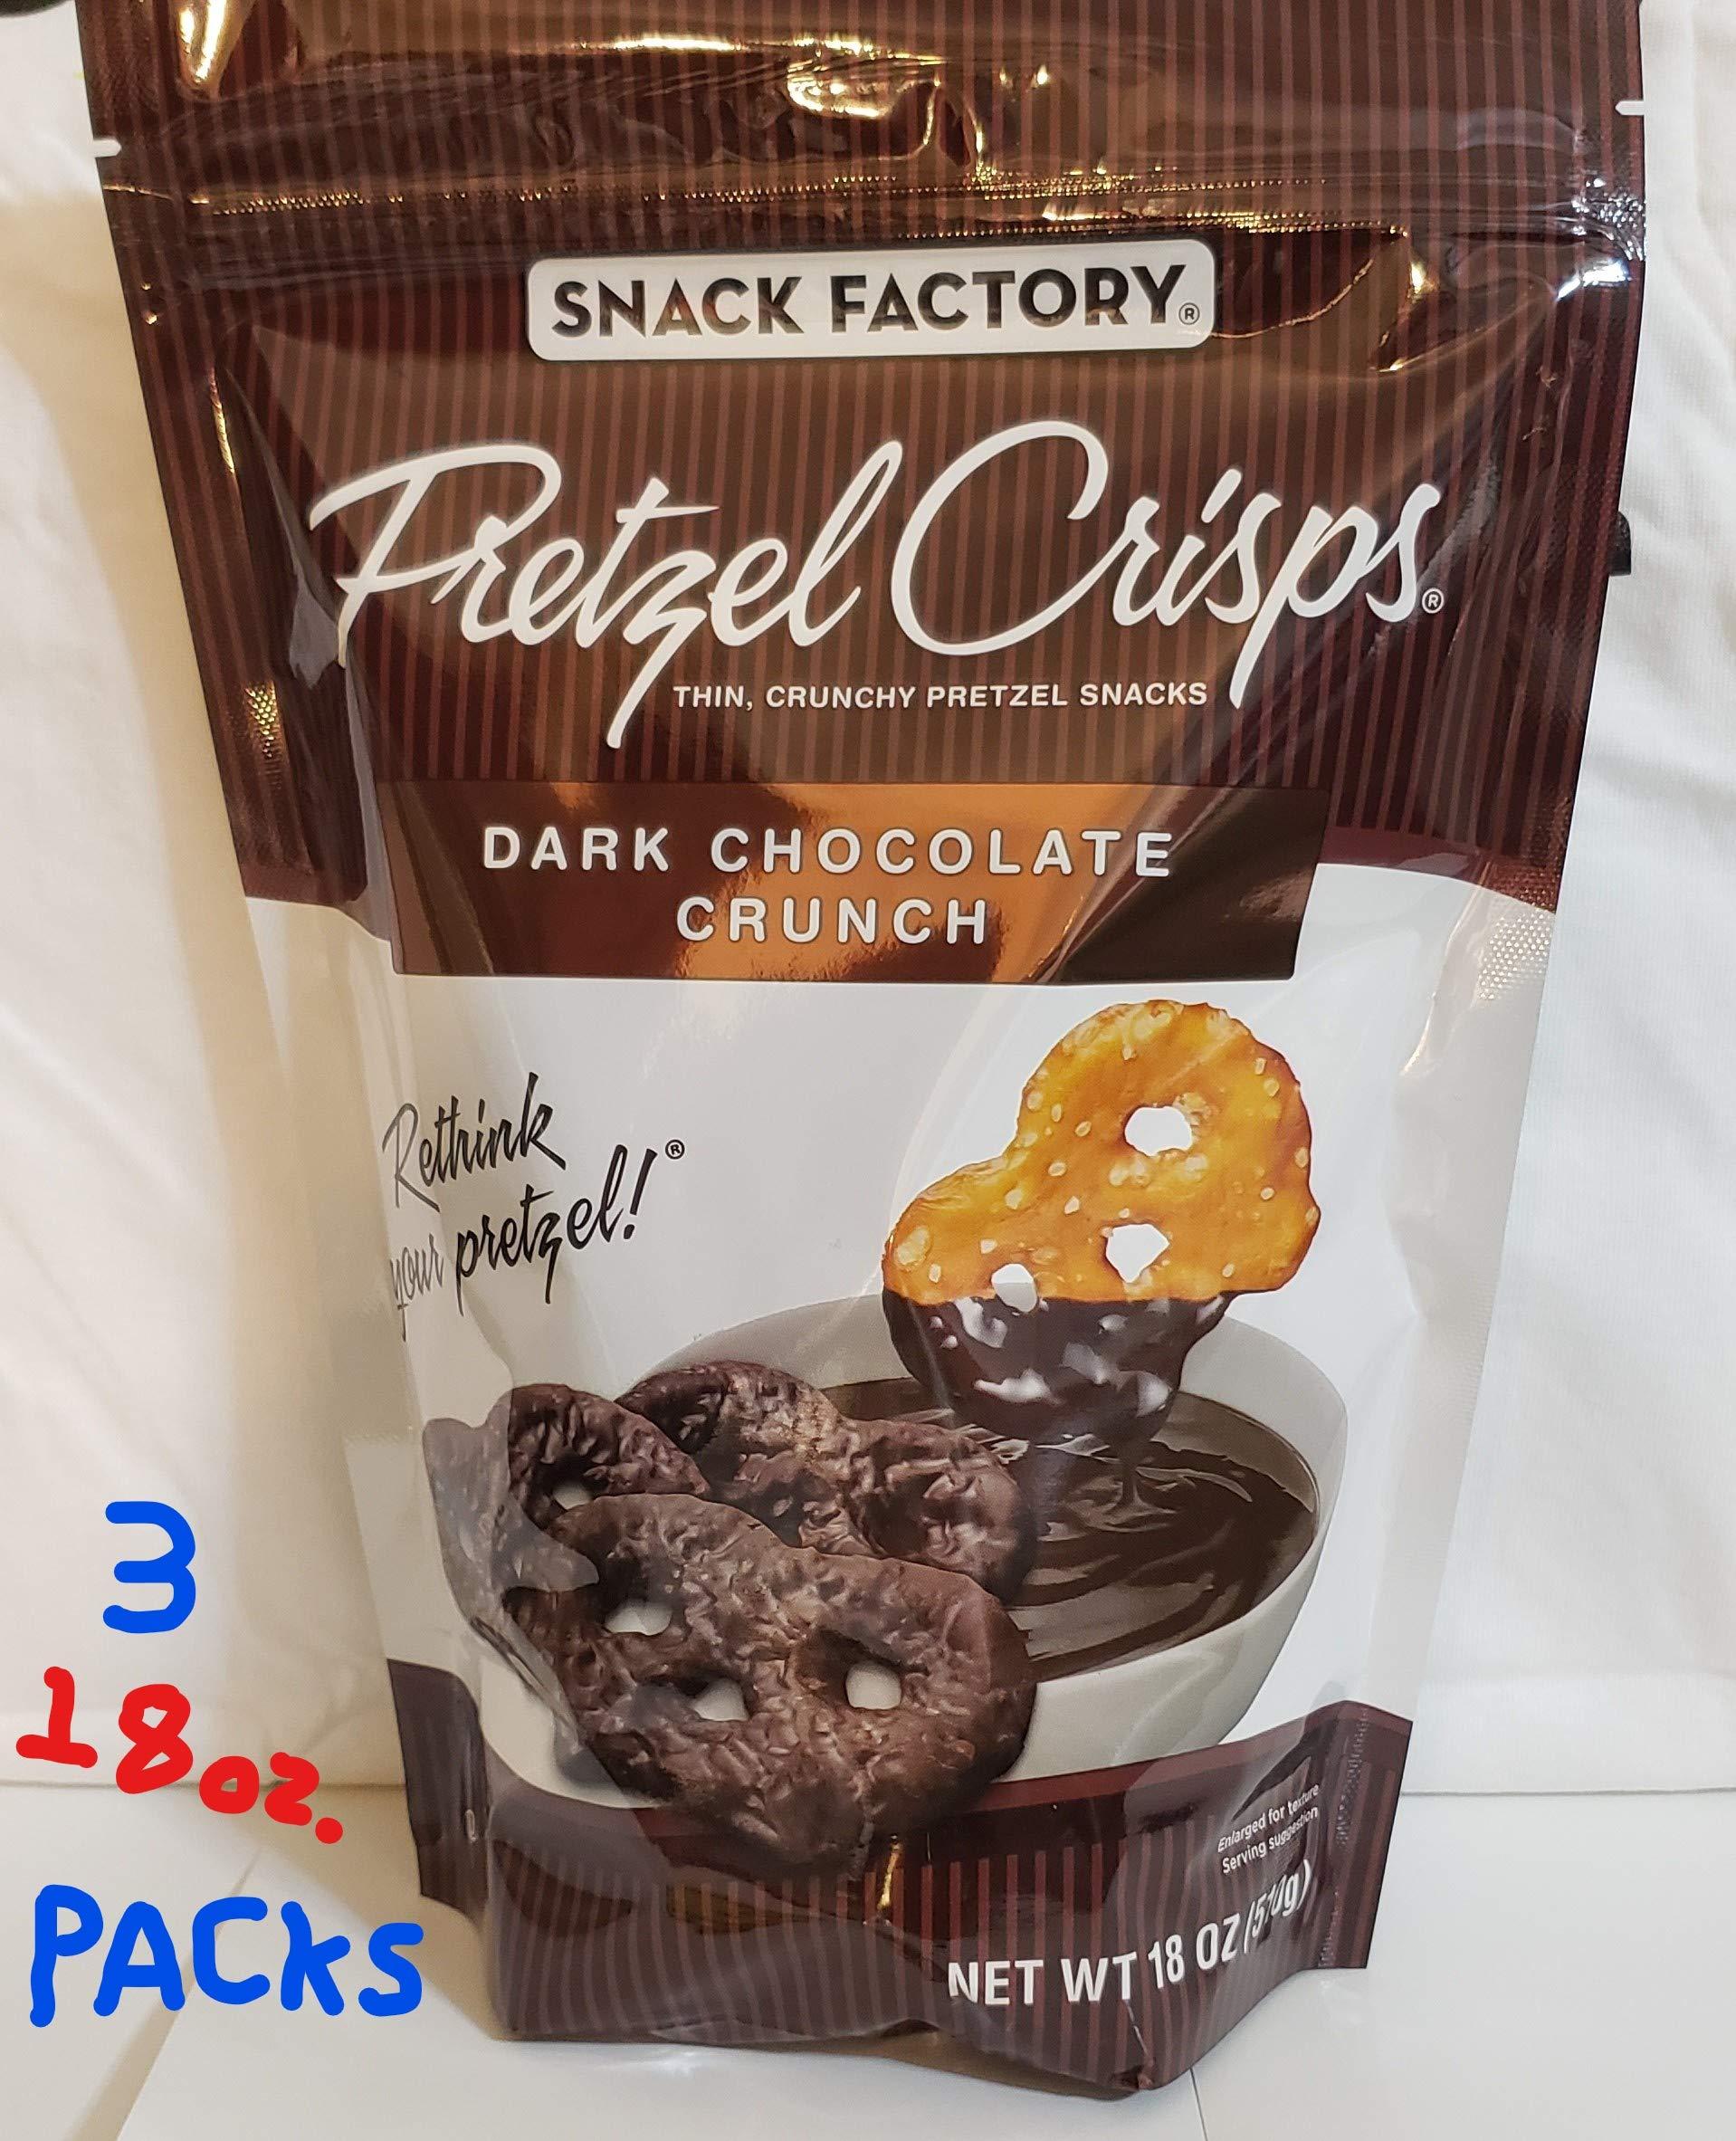 Snack Factory Pretzel Crisps, Dark Chocolate Crunch, 22 Oz. (Pack of 2) by Snack Factory Pretzel Crisps